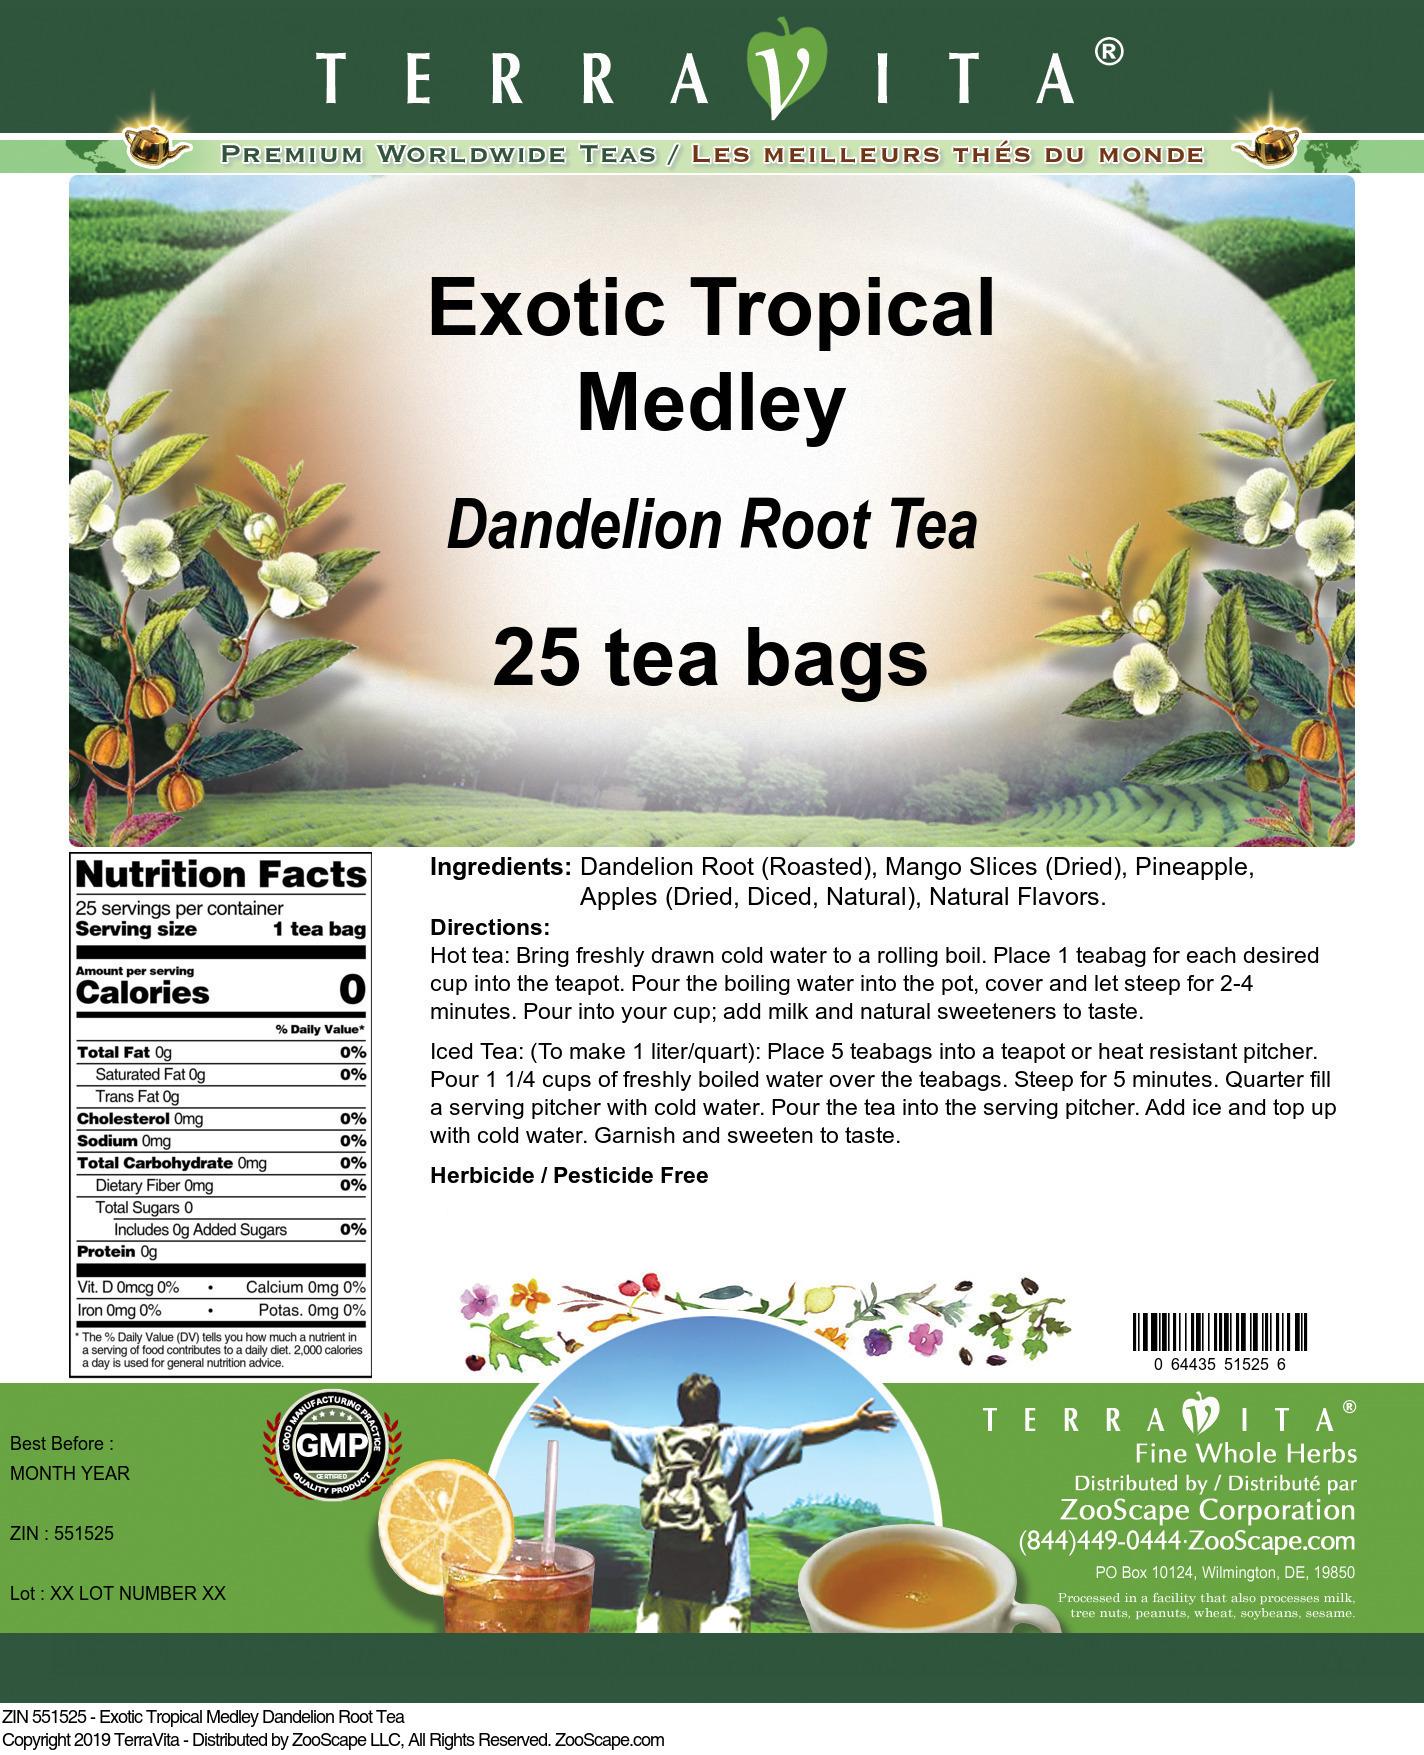 Exotic Tropical Medley Dandelion Root Tea